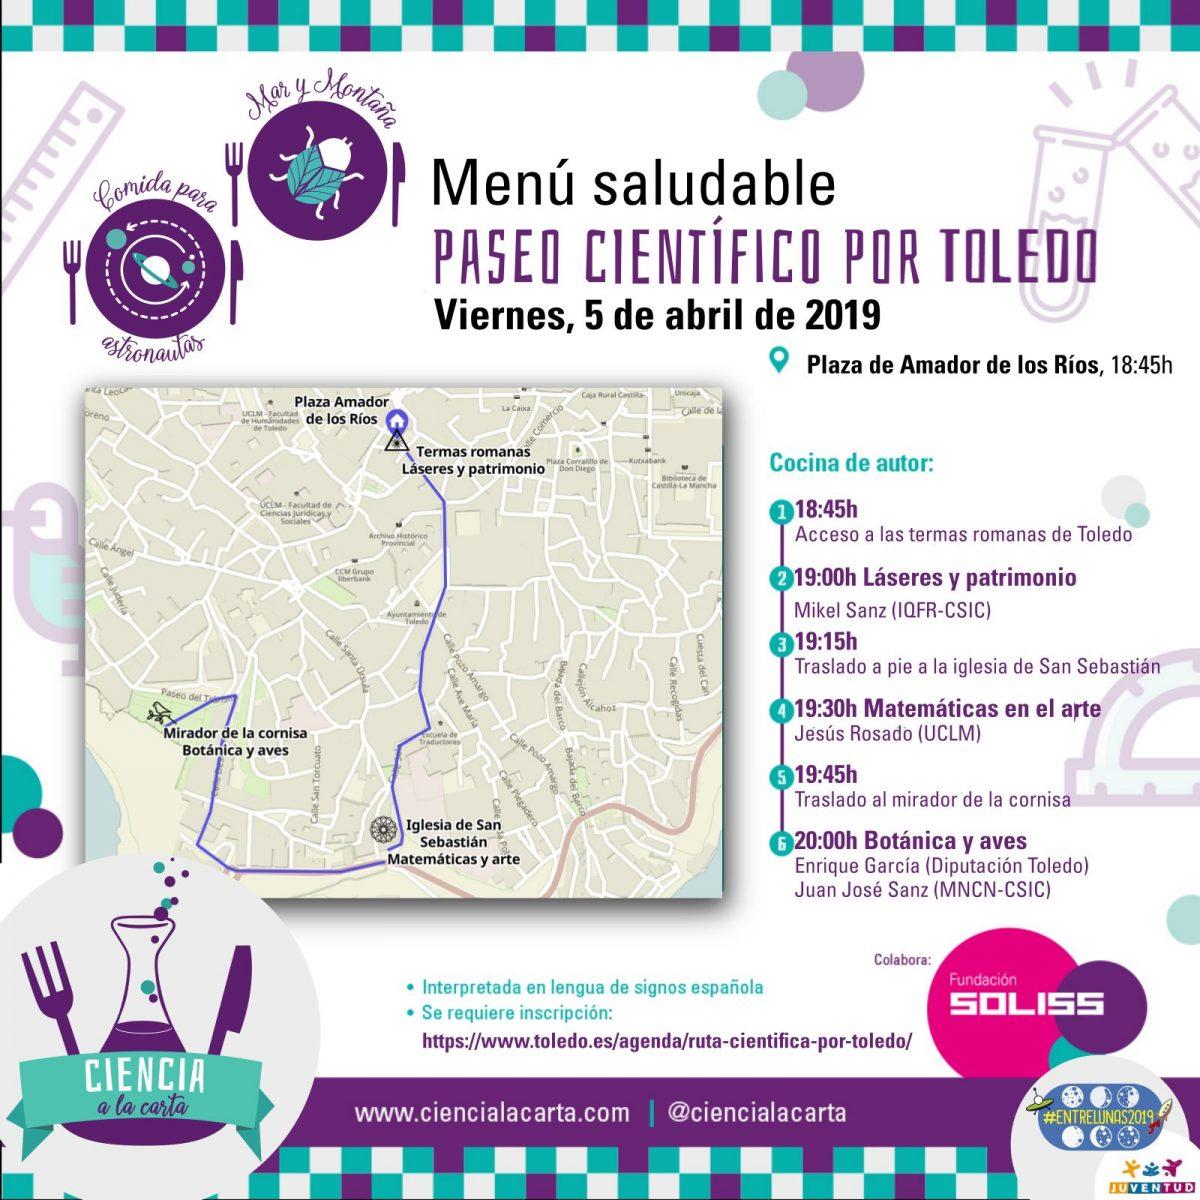 https://www.toledo.es/wp-content/uploads/2019/03/flyer-20x20-3-1200x1200.jpg. Paseo  científico por Toledo